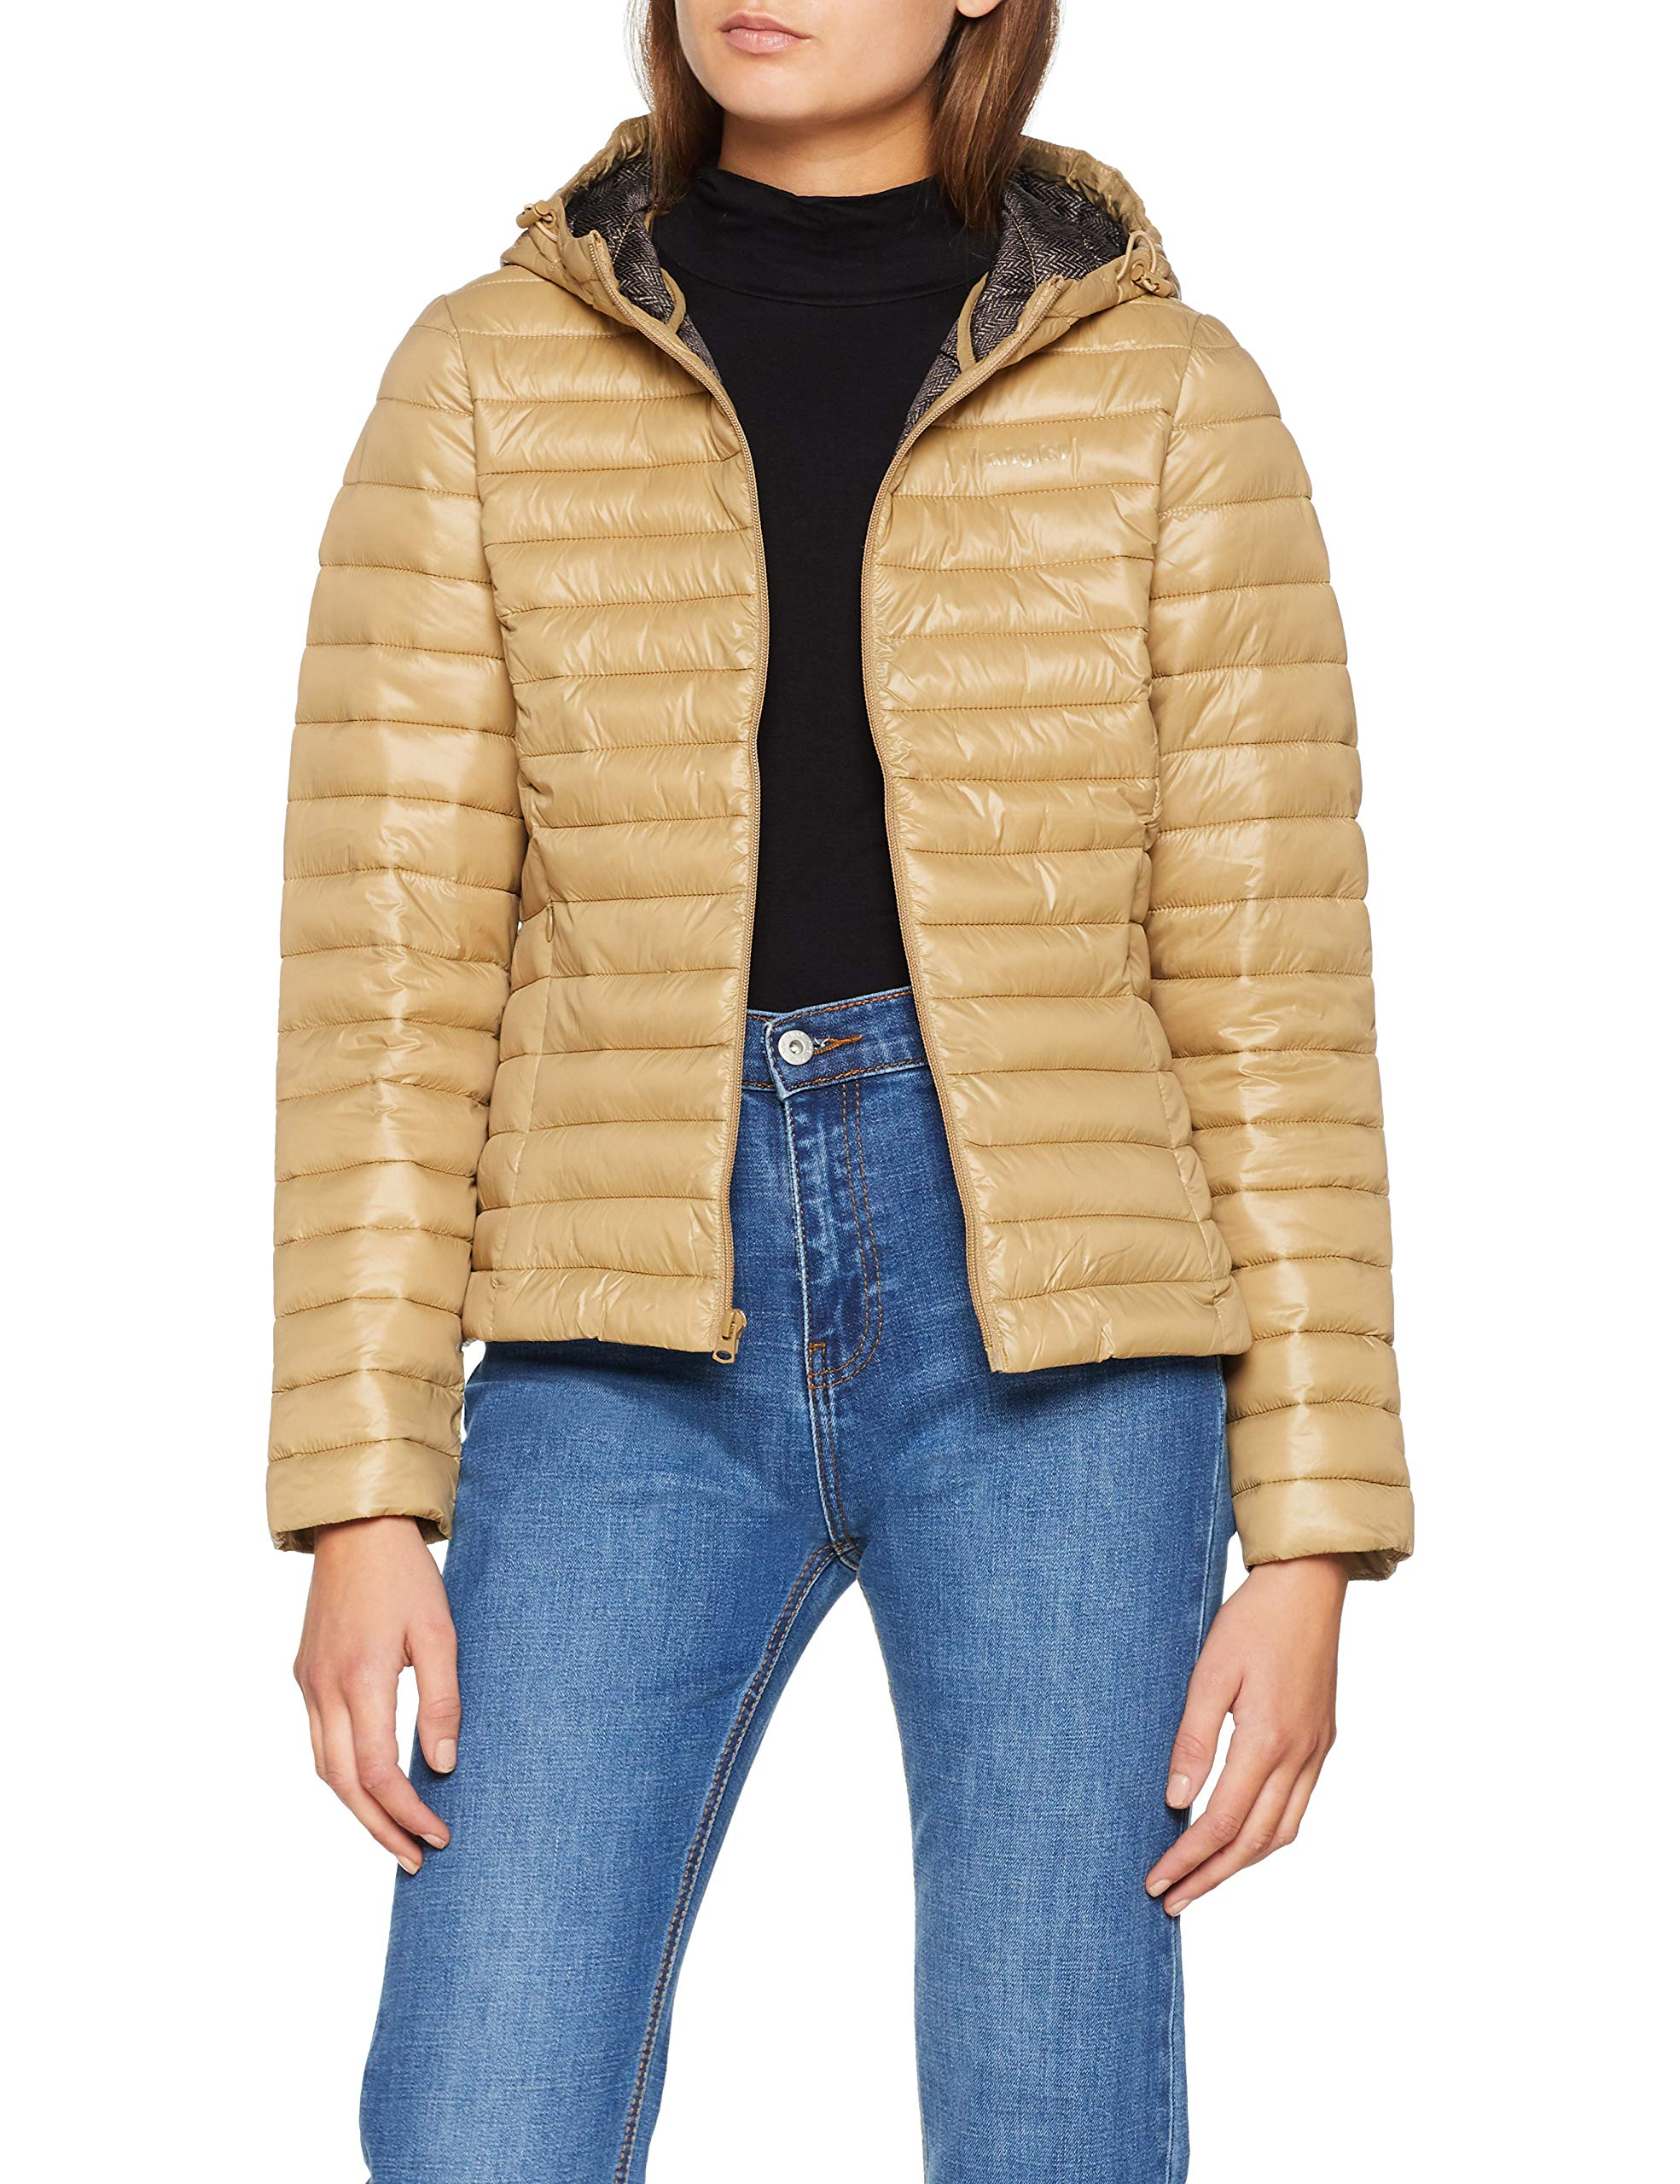 Puffer BlousonClay Wrangler Beige Femme Jacket 4wmMedium ohrxdsQtCB